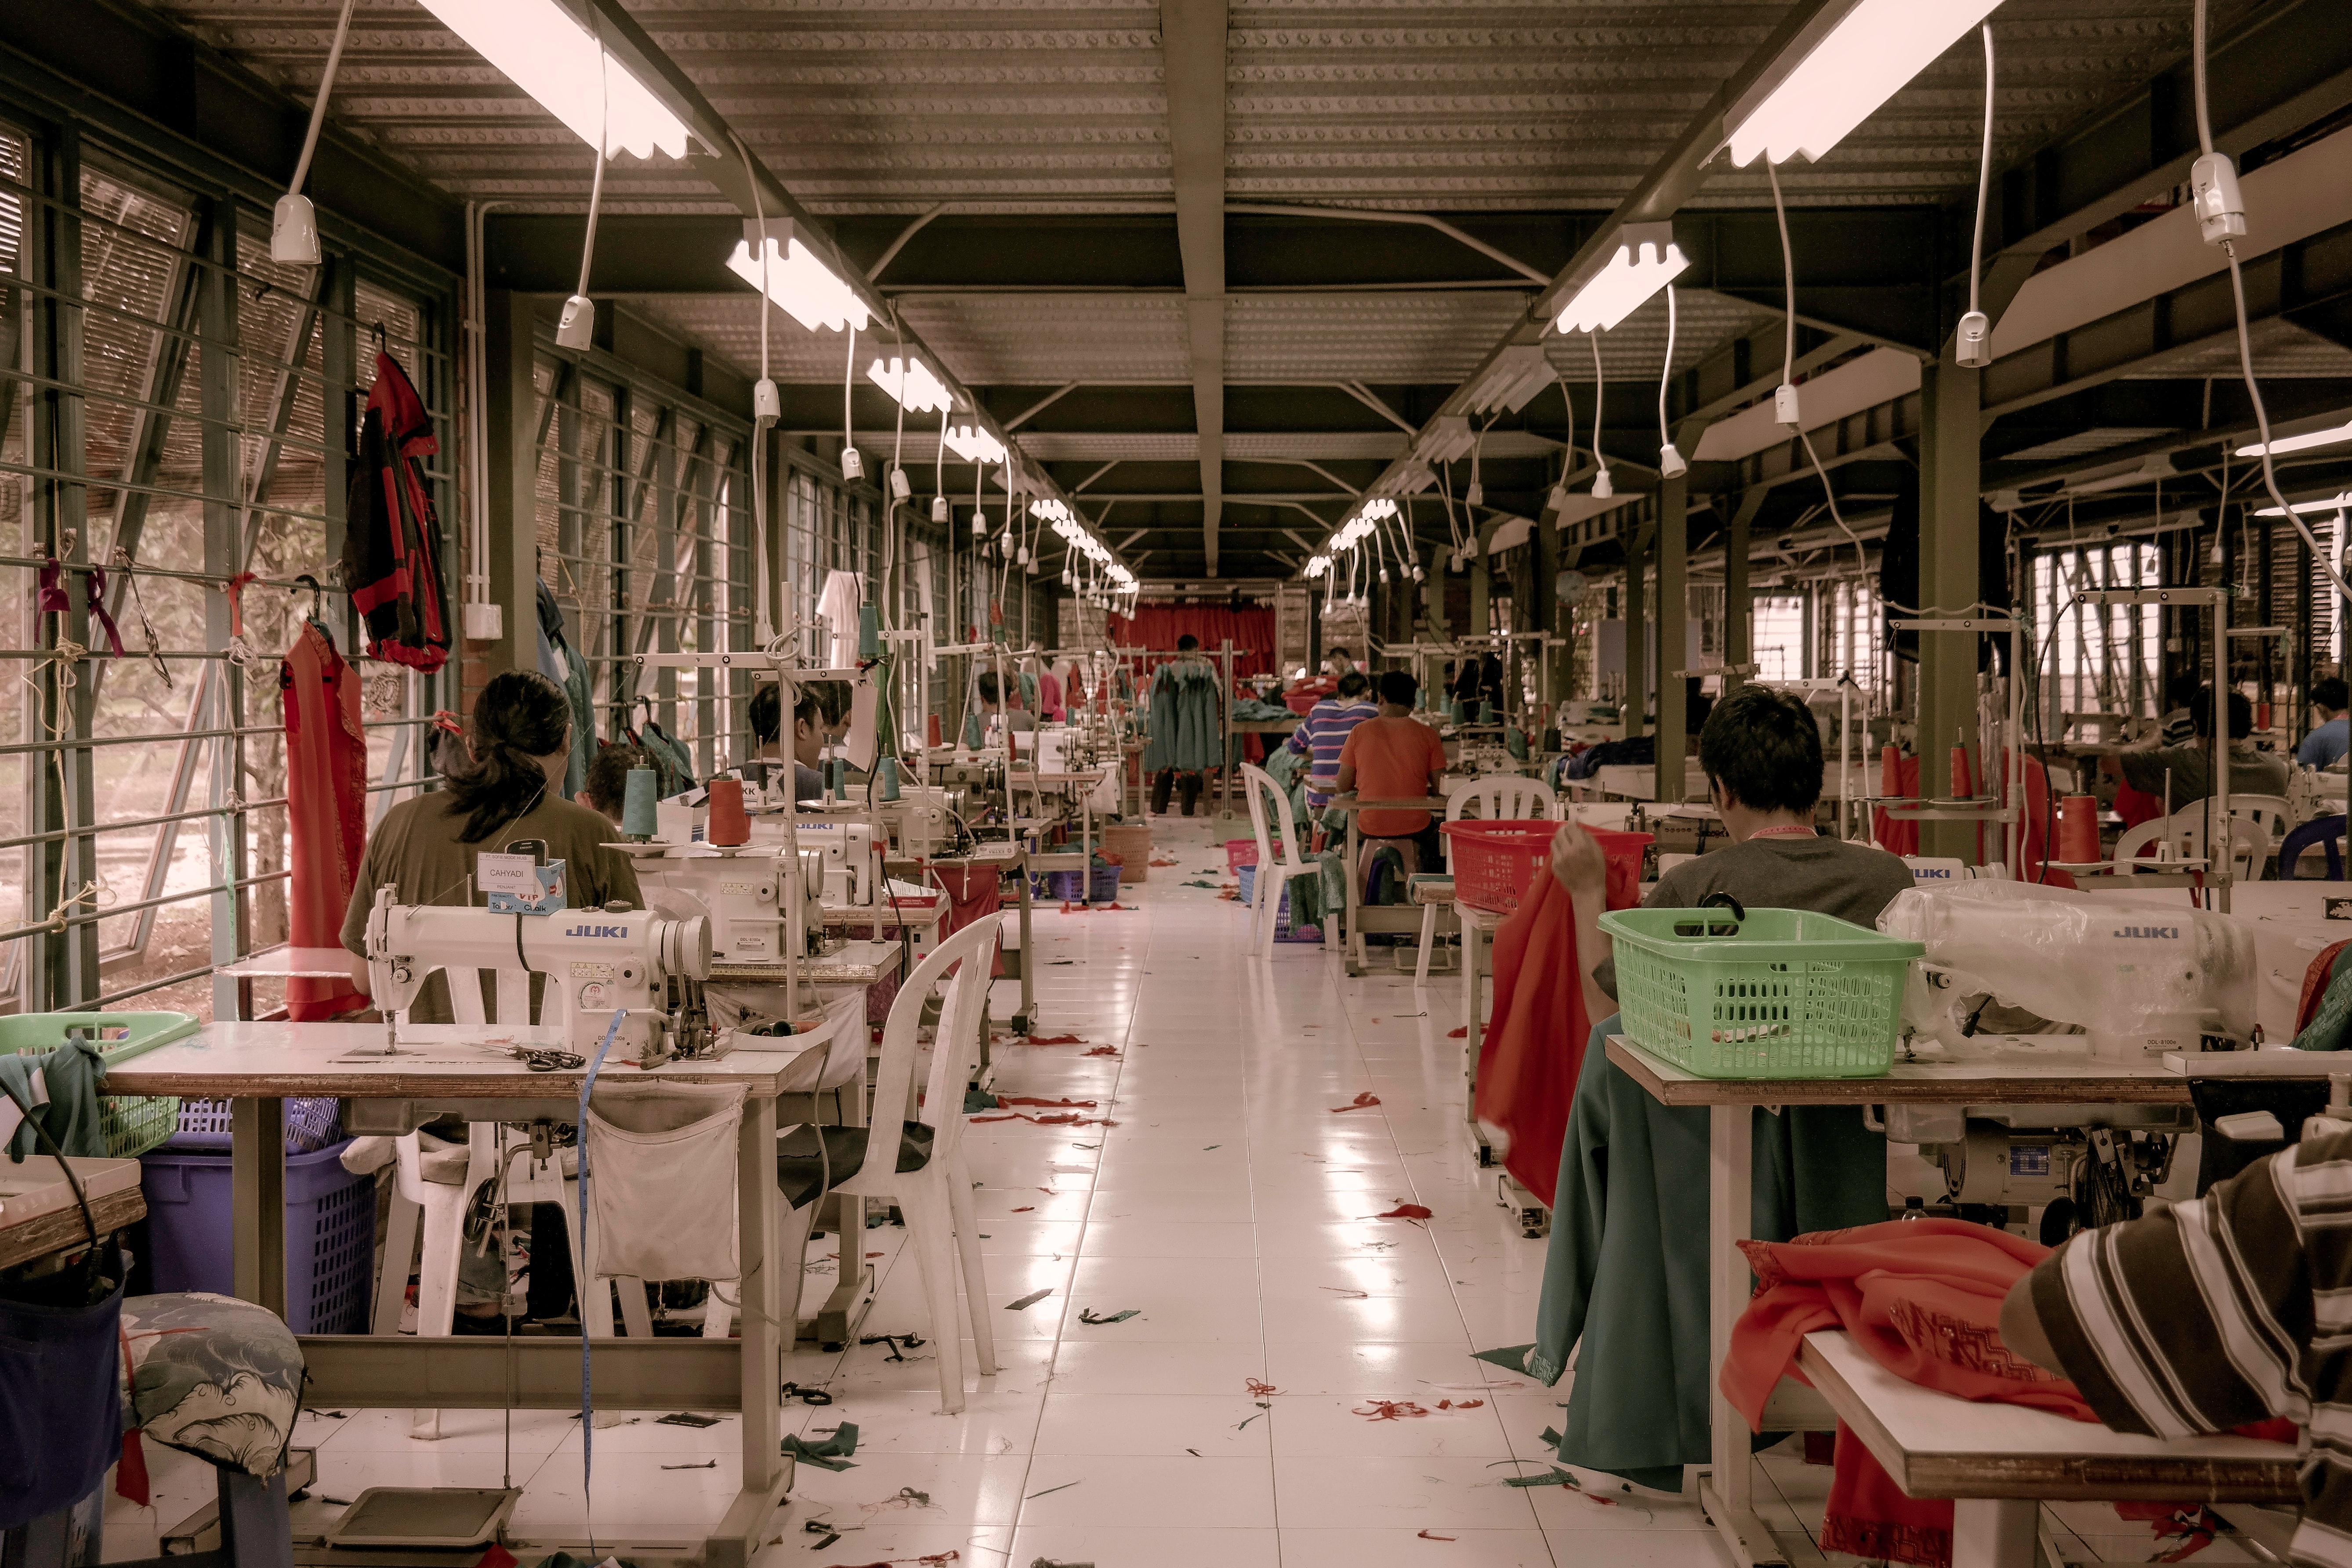 Seamstresses at work